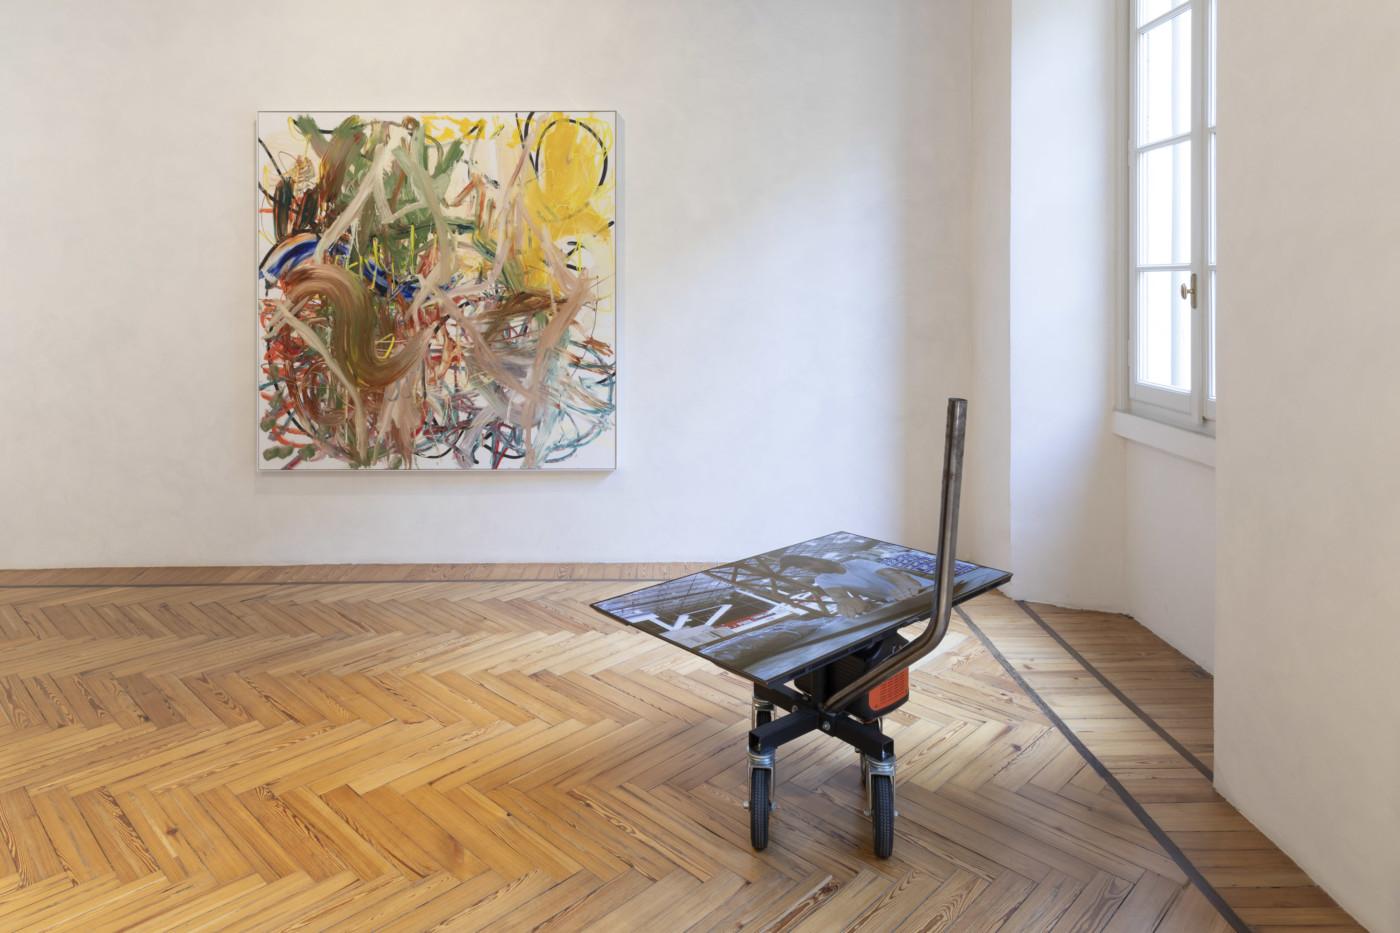 AARON  GARBER-MAIKOVSKA  Yucaipa,  2021, Massimo de Carlo Gallery, Milan, Italy, installation view - High Art Gallery Paris